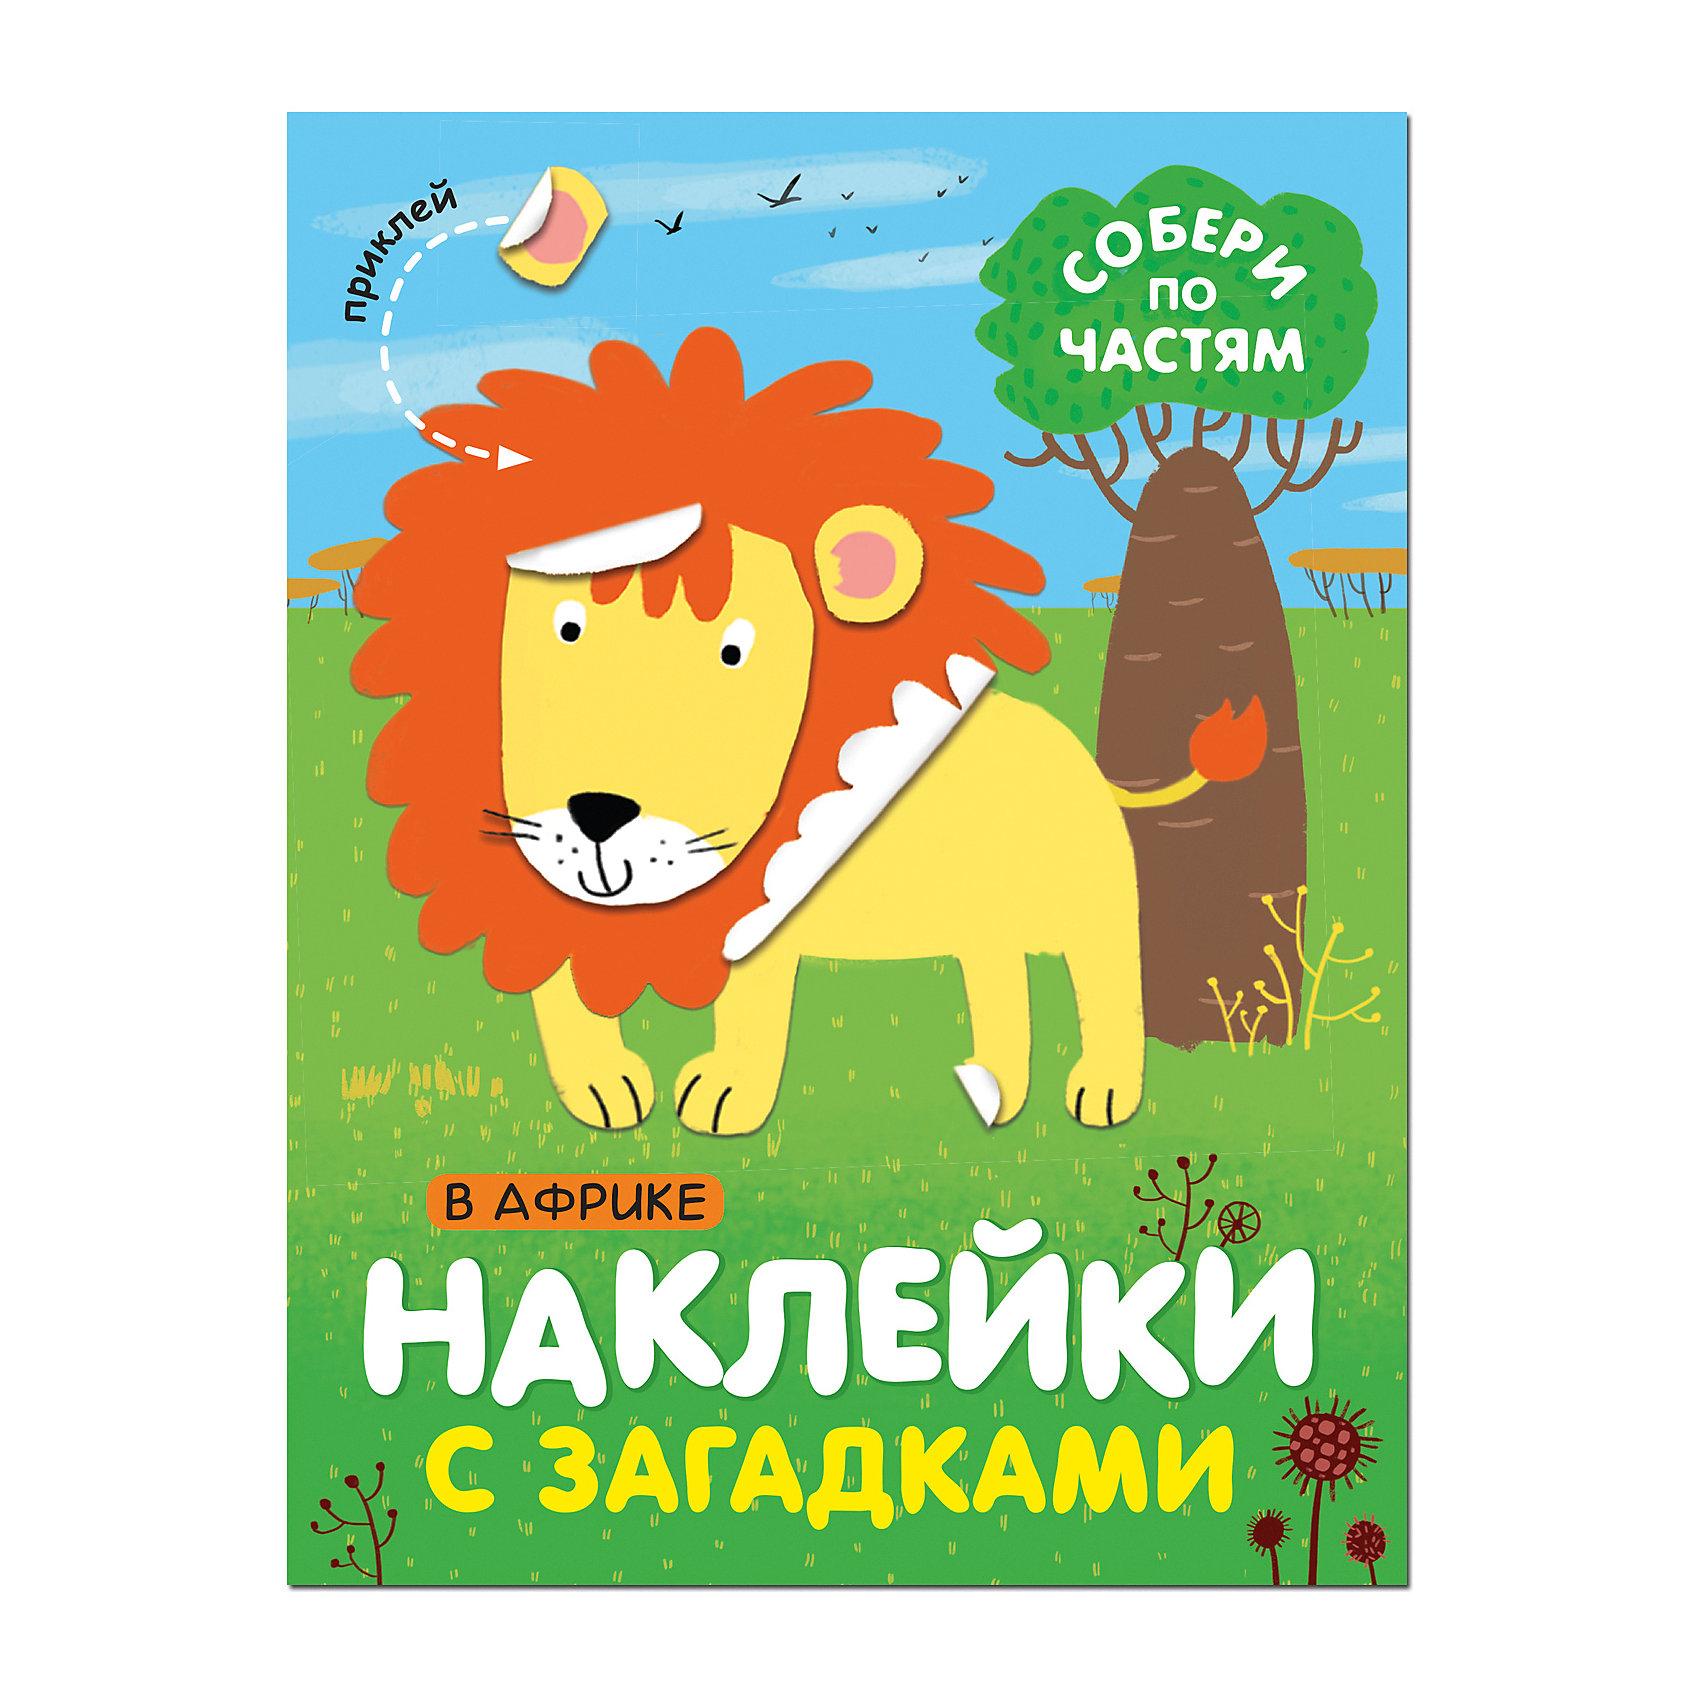 Книга с наклейками Наклейки с загадками. Собери по частям В Африке